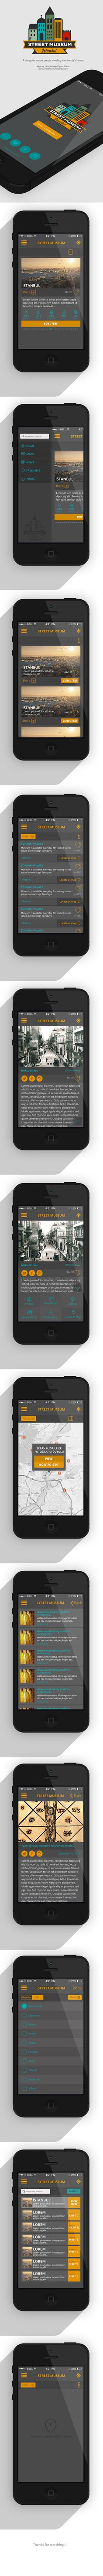 Istanbul Street Museum IOS App on Behance